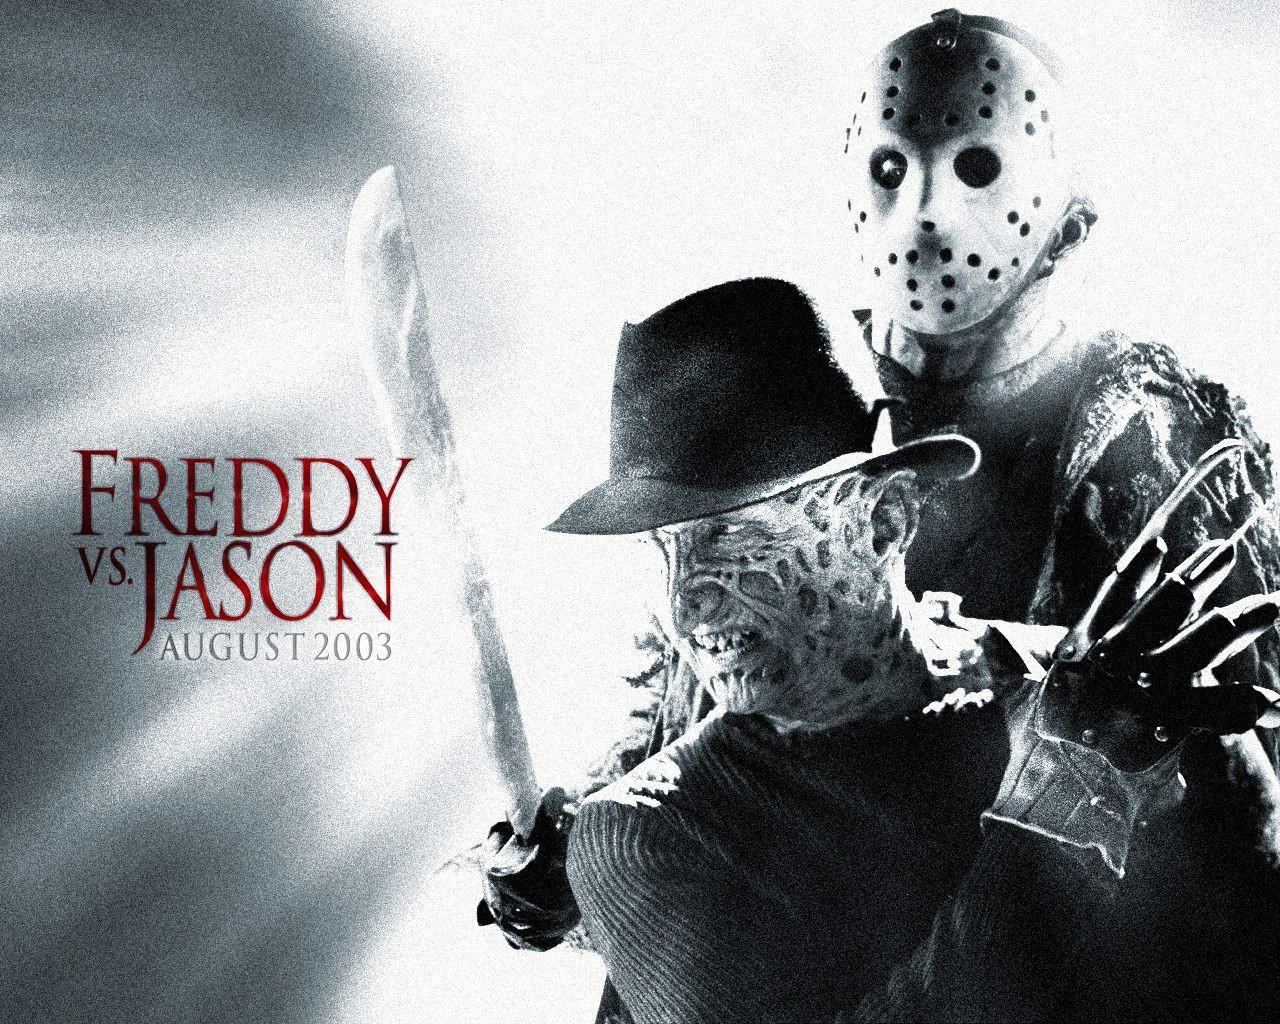 Download Film Freddy Vs Jason 2003